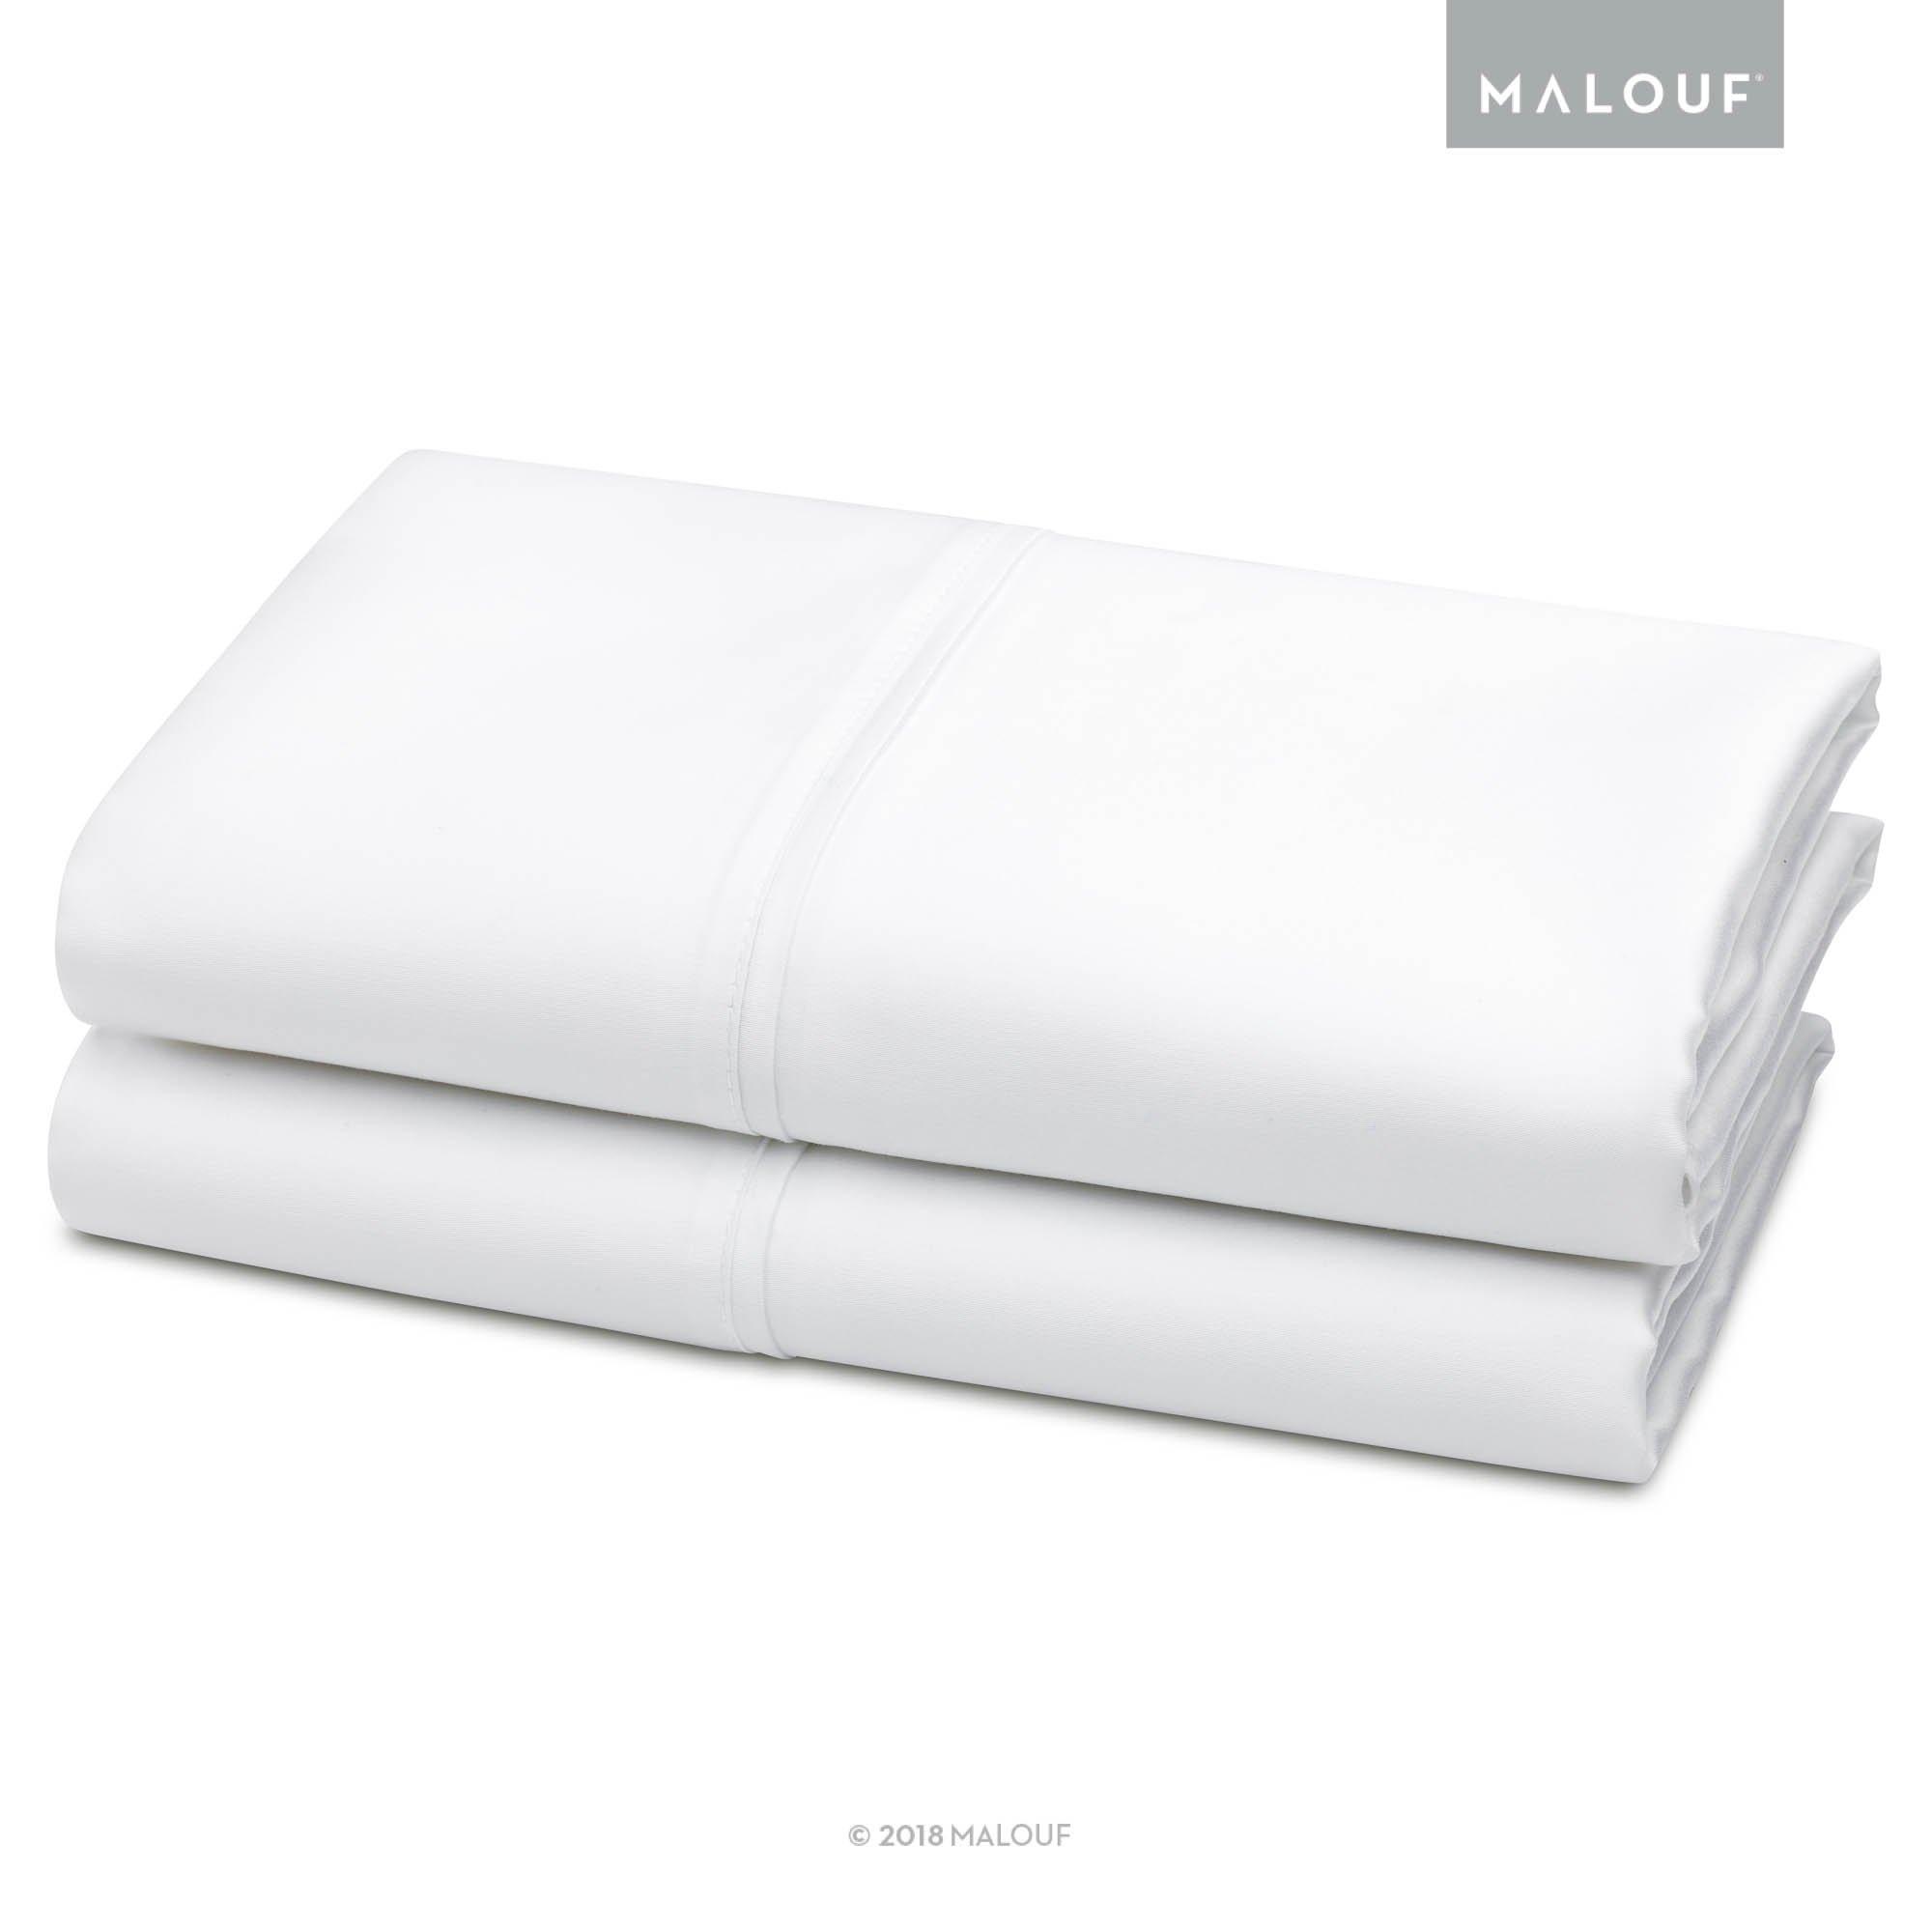 Malouf Tencel Pillowcase Set-Silky Soft, Refreshing and Eco-Friendly-King-Dusk-2pc, King, White